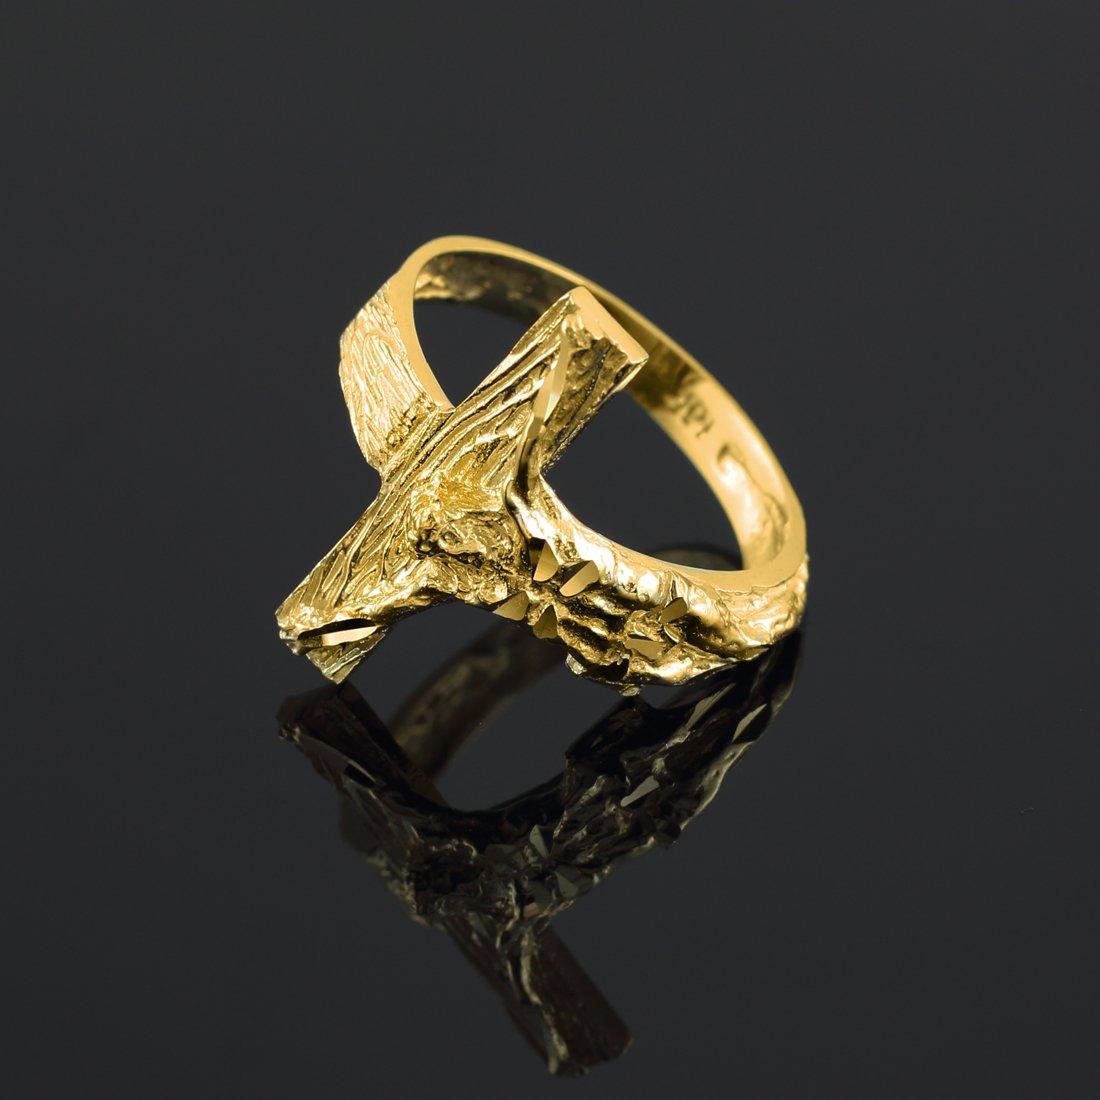 10k Yellow Gold Crucifix Cross Band Ring